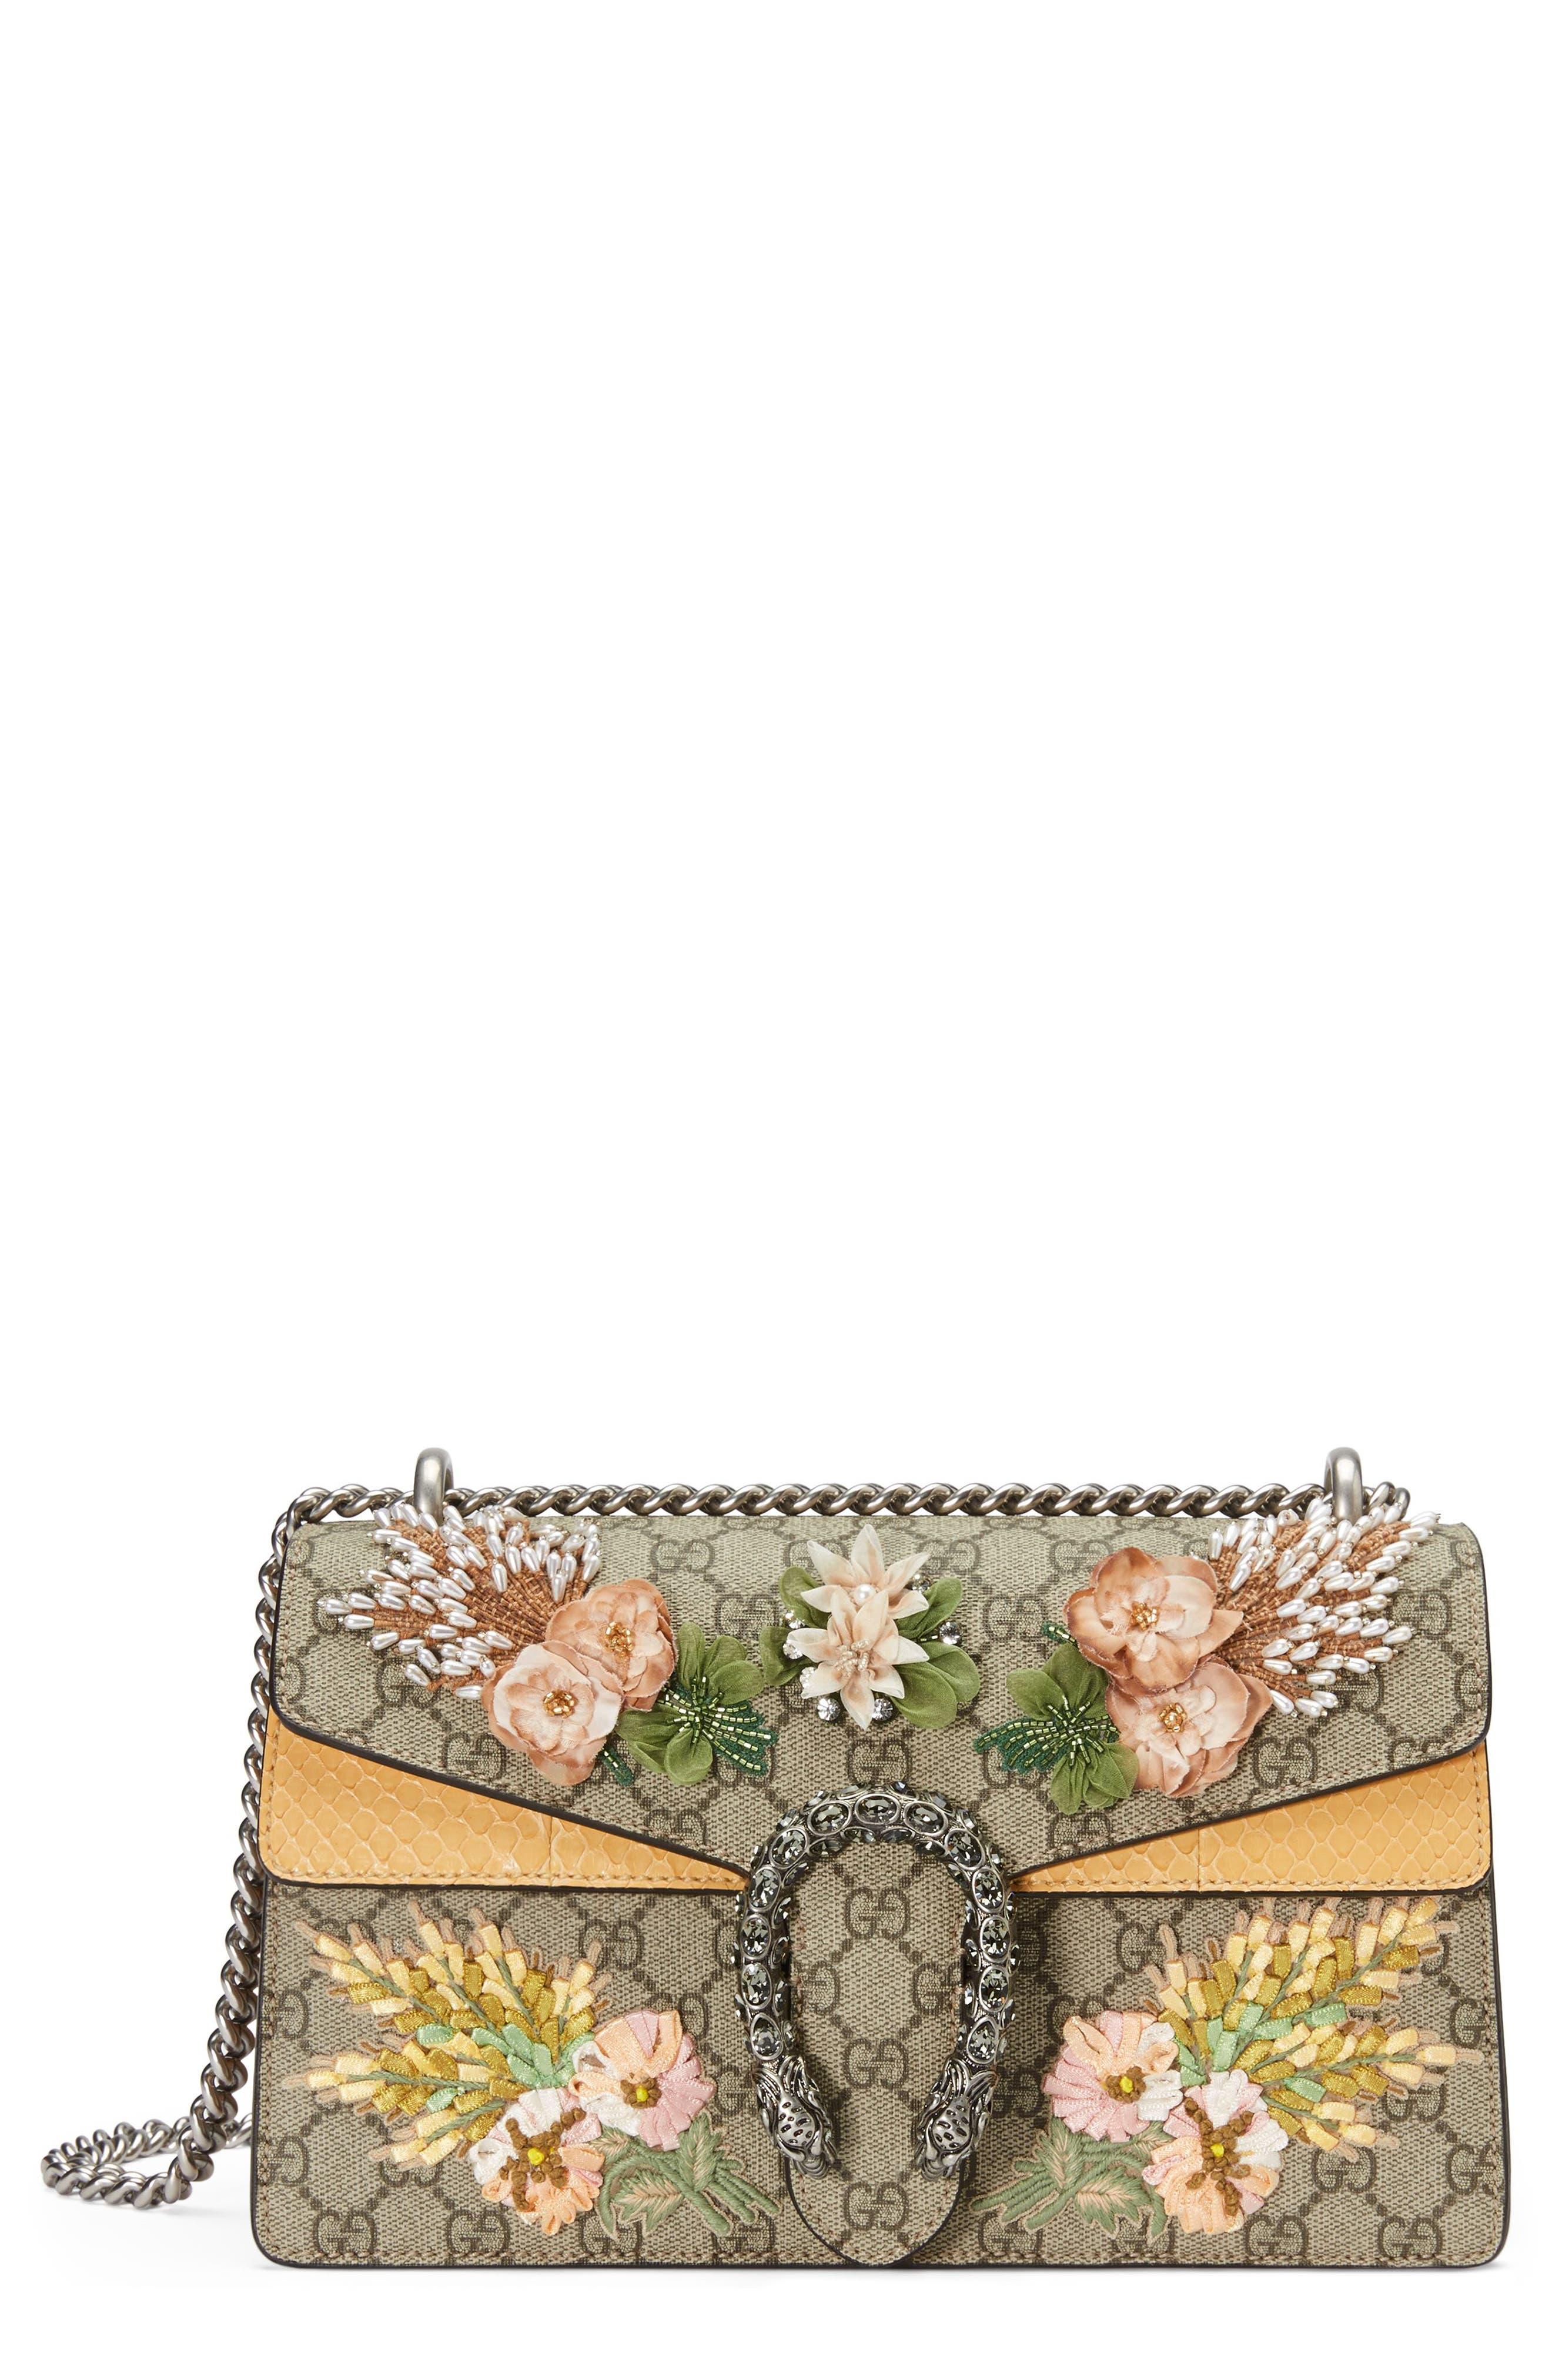 Small Dionysus Embellished GG Supreme & Genuine Python Shoulder Bag,                             Main thumbnail 1, color,                             BEIGE EBONY/ VIPER YELLOW